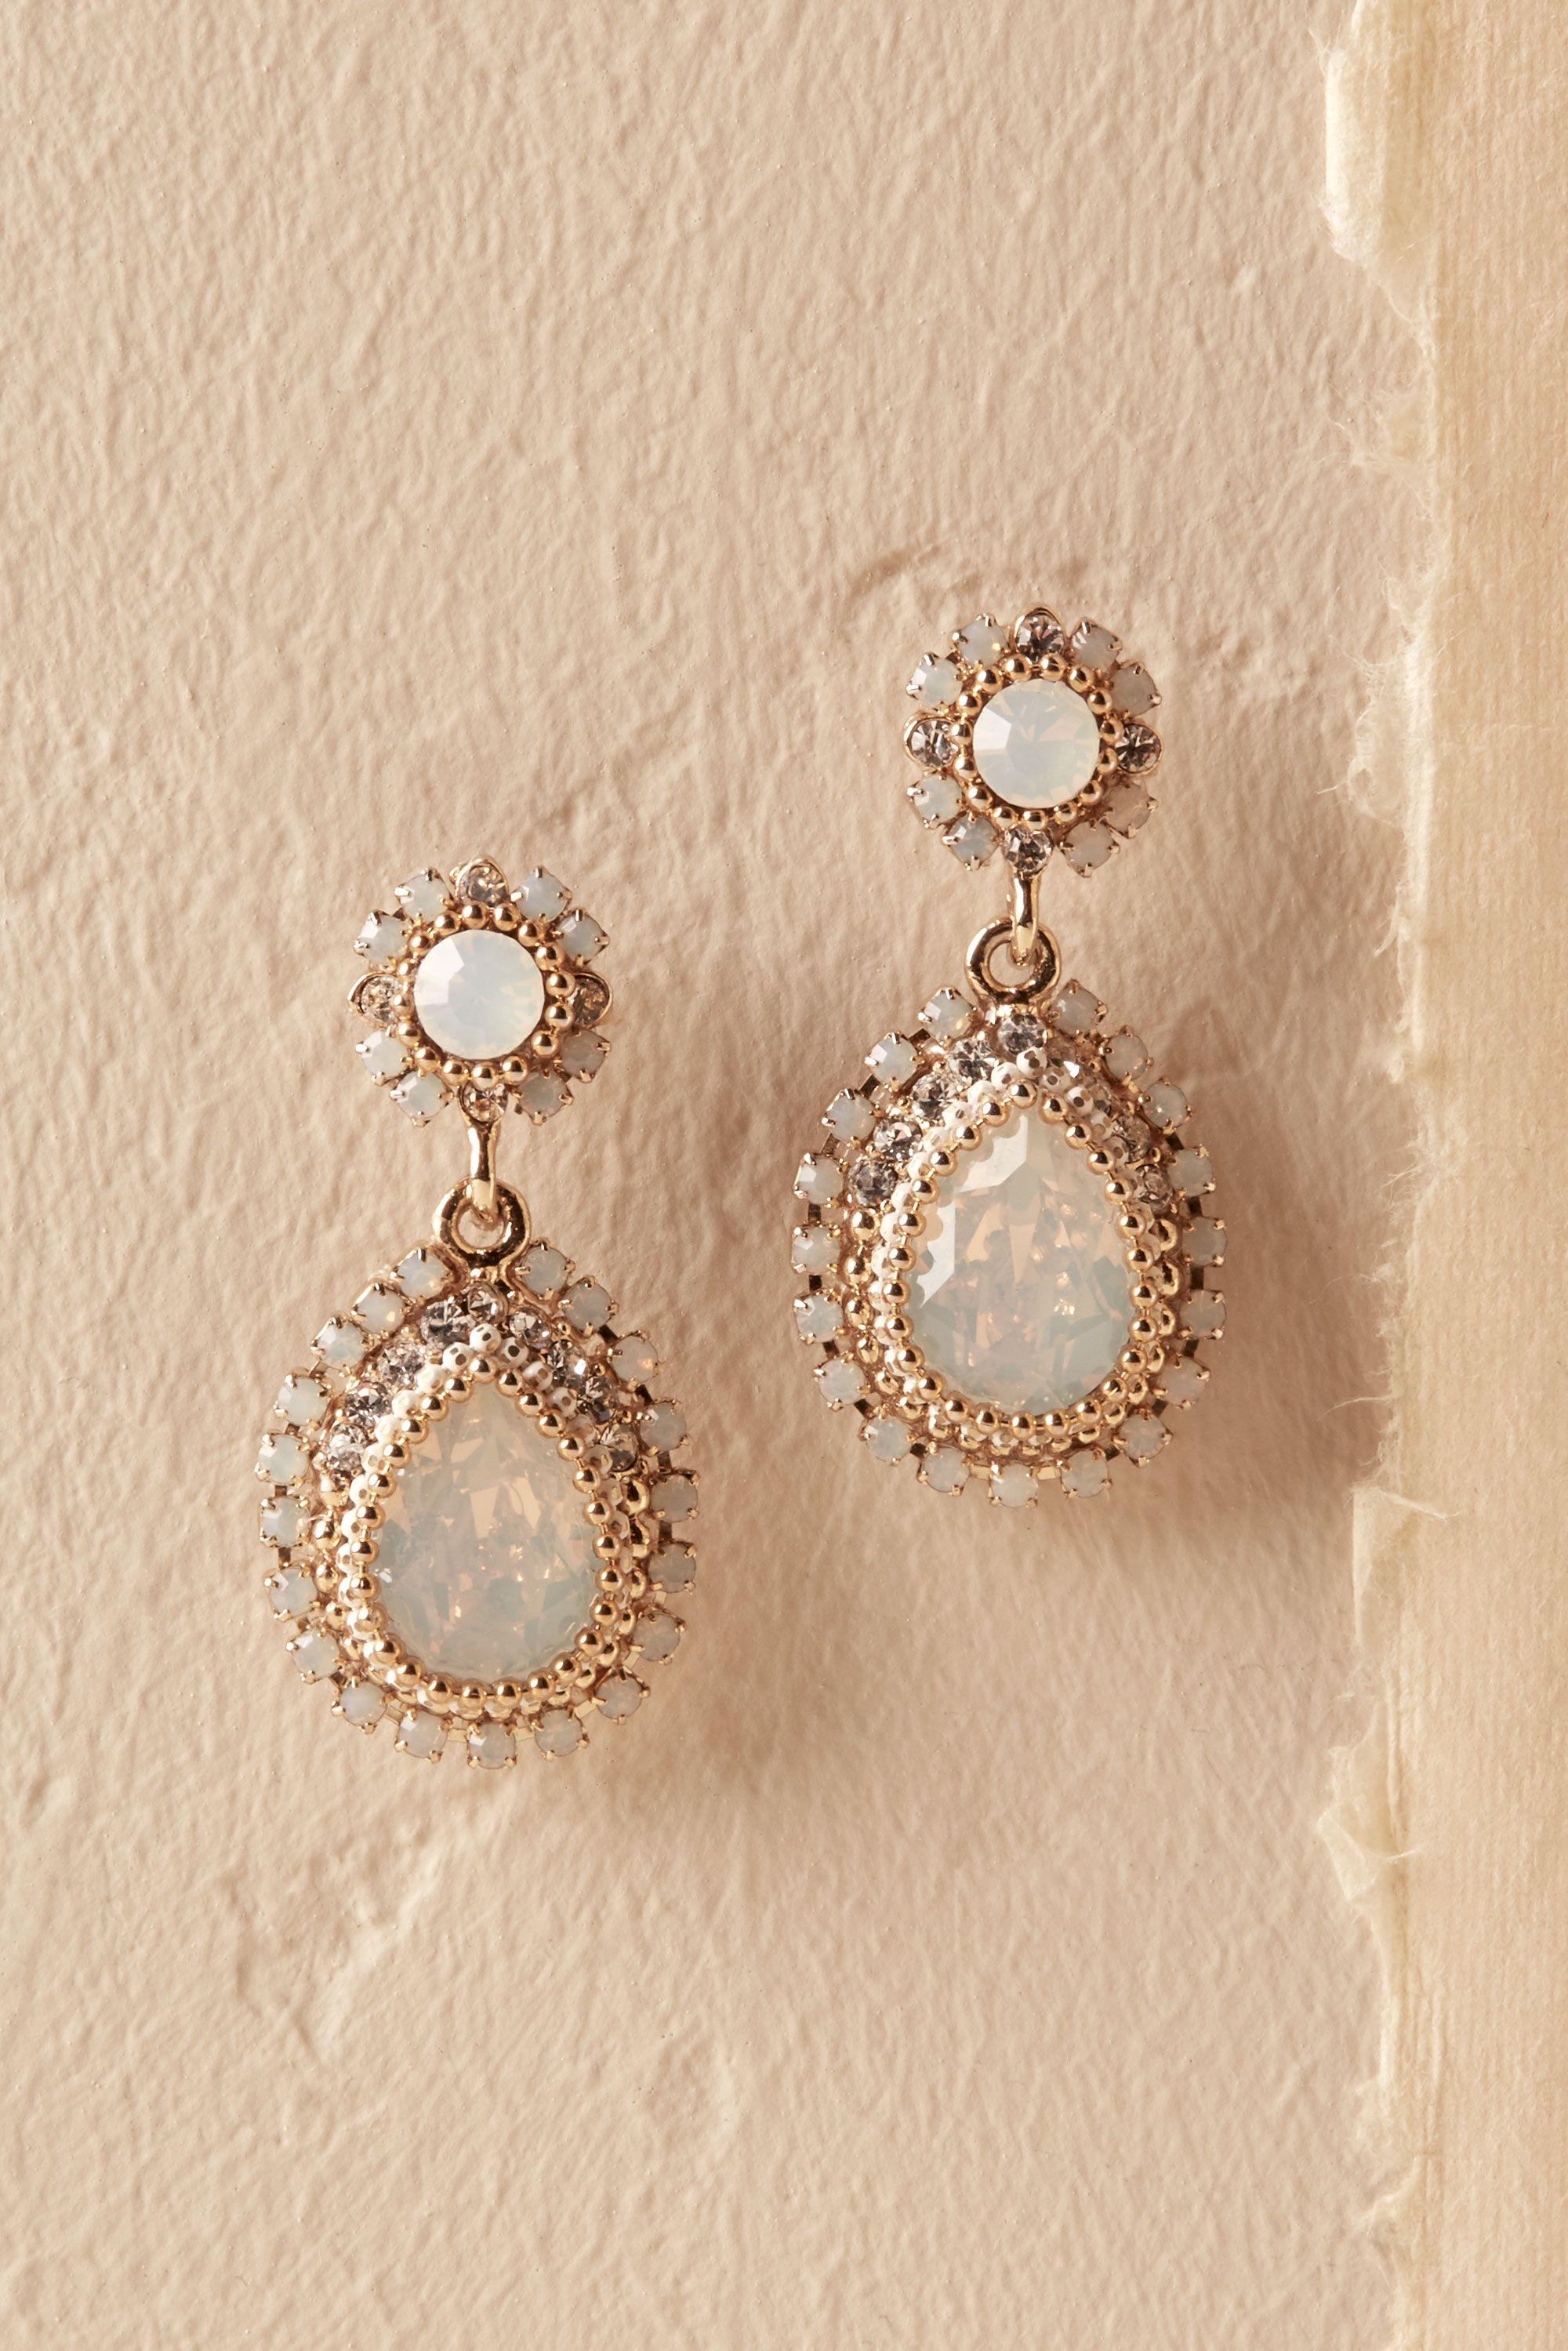 Vintage Inspired Jewelry Bohemian Jewelry BHLDN